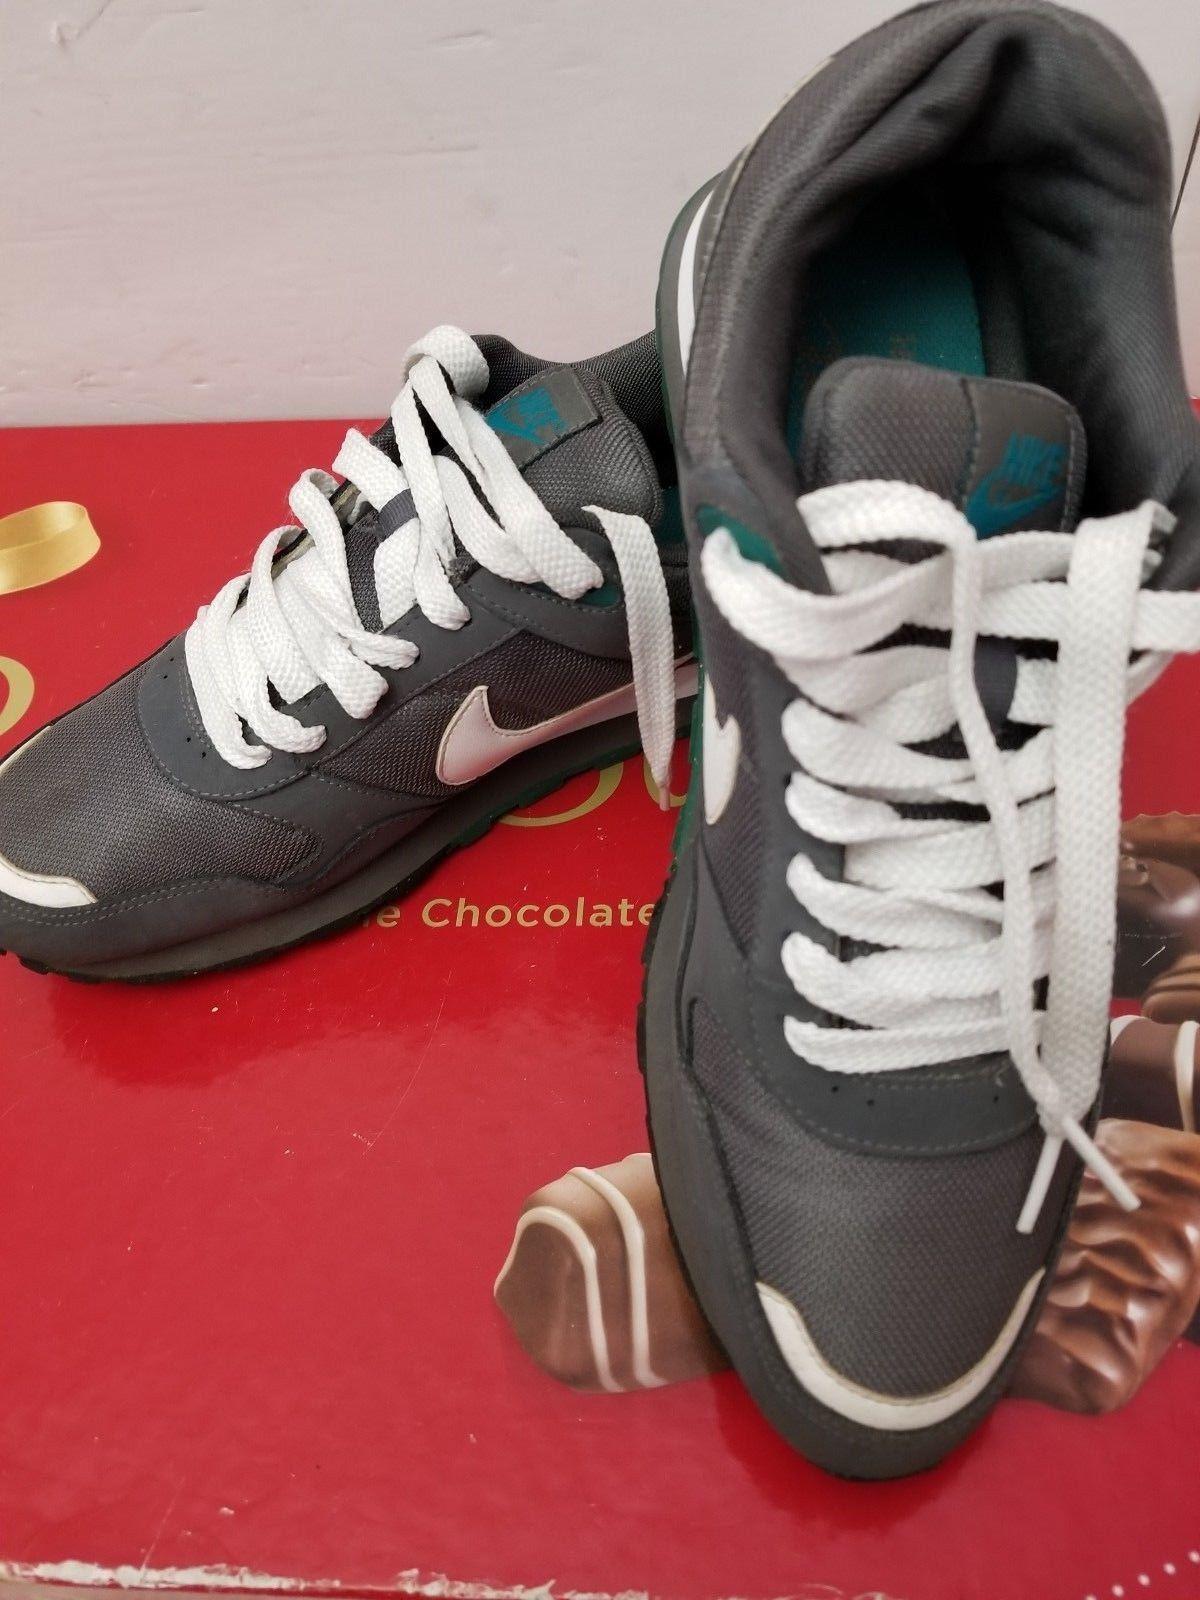 Nike 386156-009 TEAL LE Air Perforated Running Athletic Sneakers Men's US 9.5